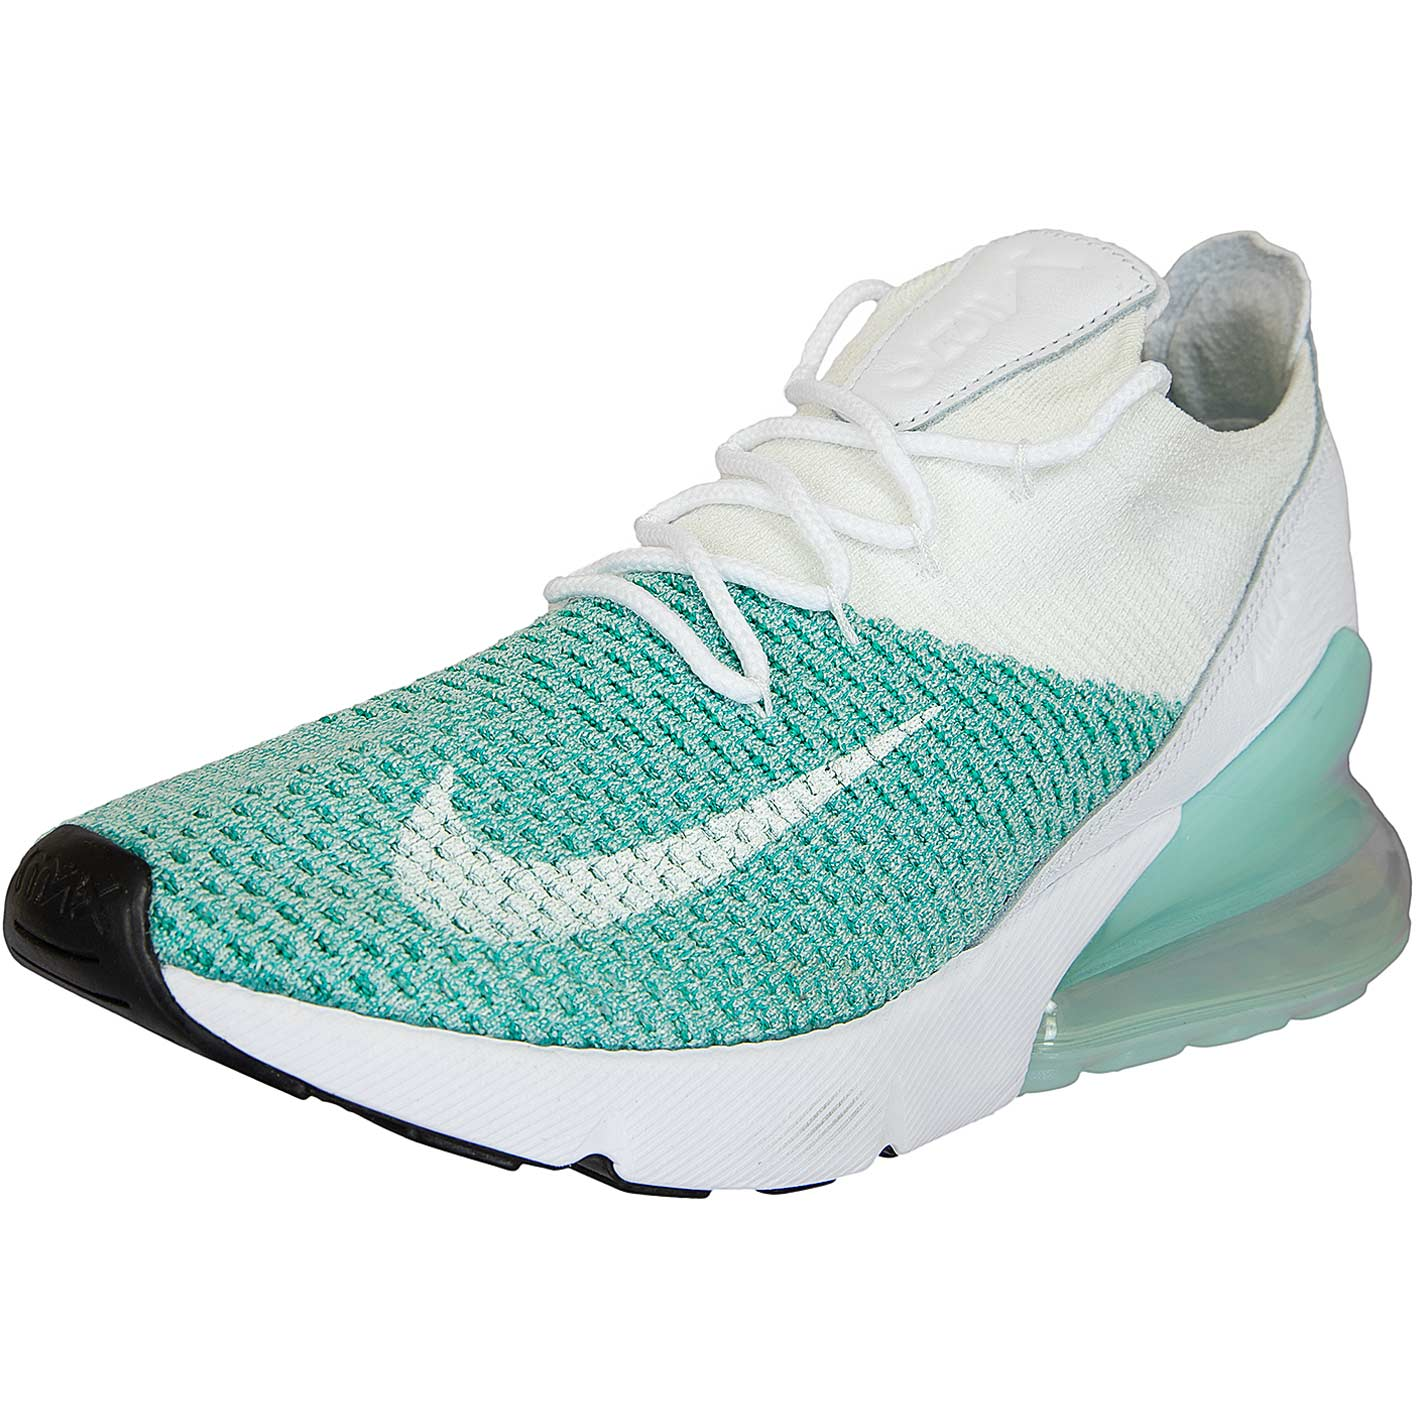 ☆ Nike Damen Sneaker Air Max 270 Flyknit türkis/weiß - hier bestellen!